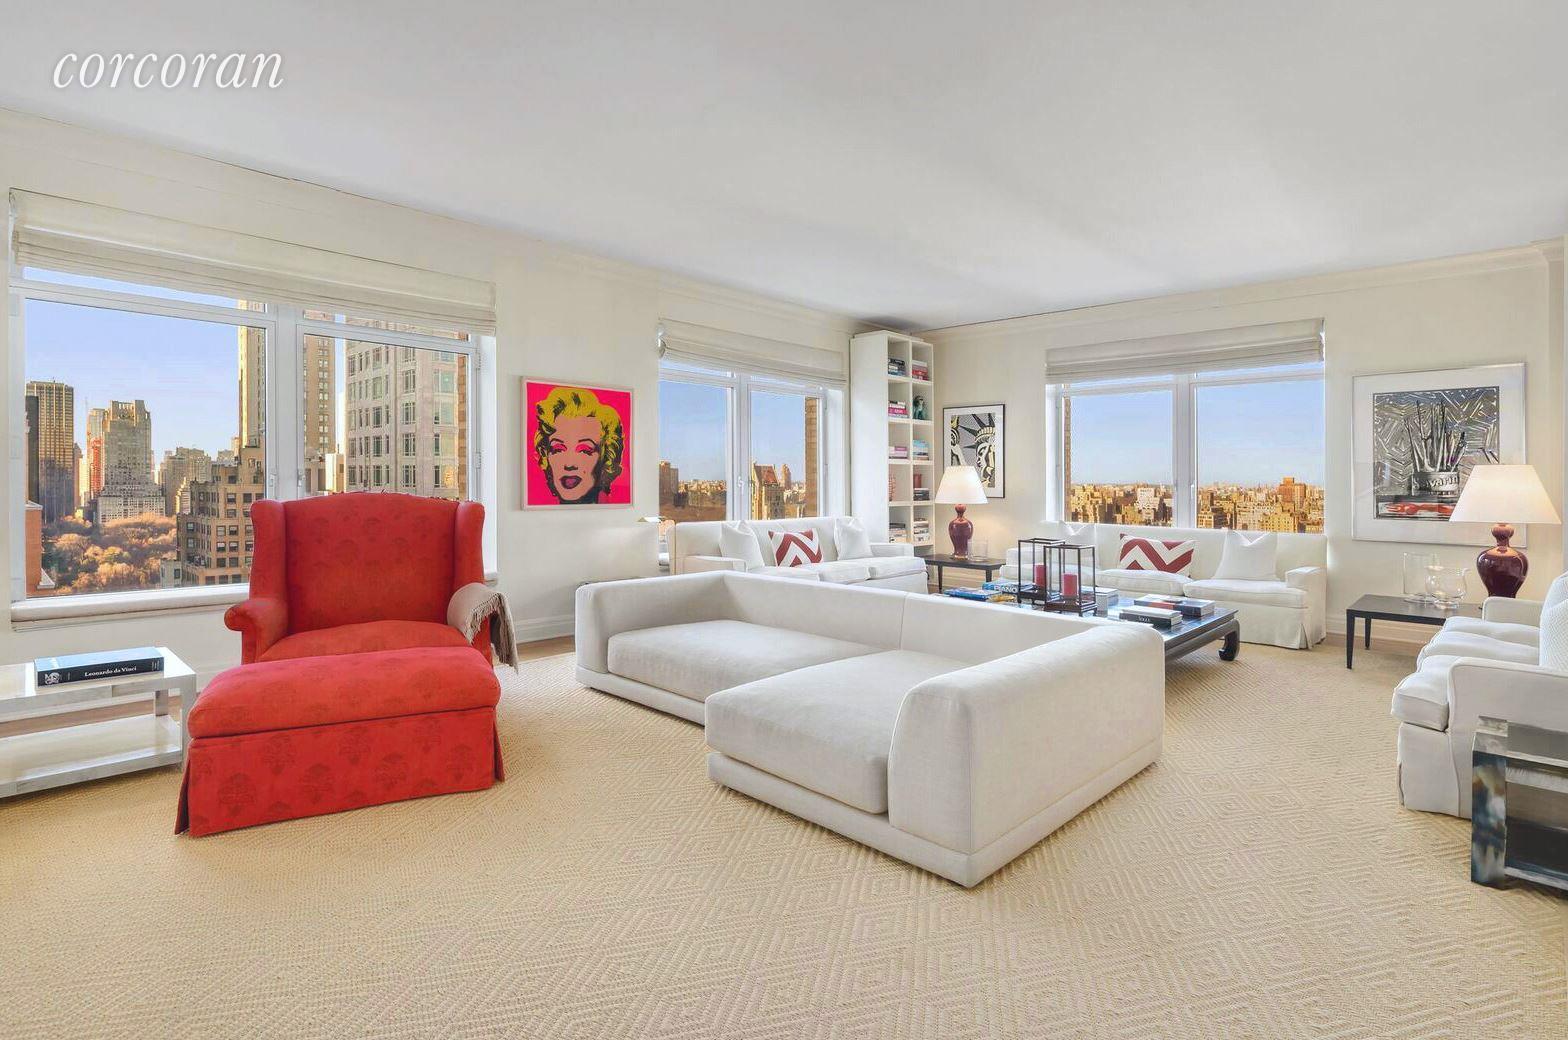 Condominium for Sale at 515 PARK AVENUE 515 PARK AVE #26 FL New York, New York,10022 United States